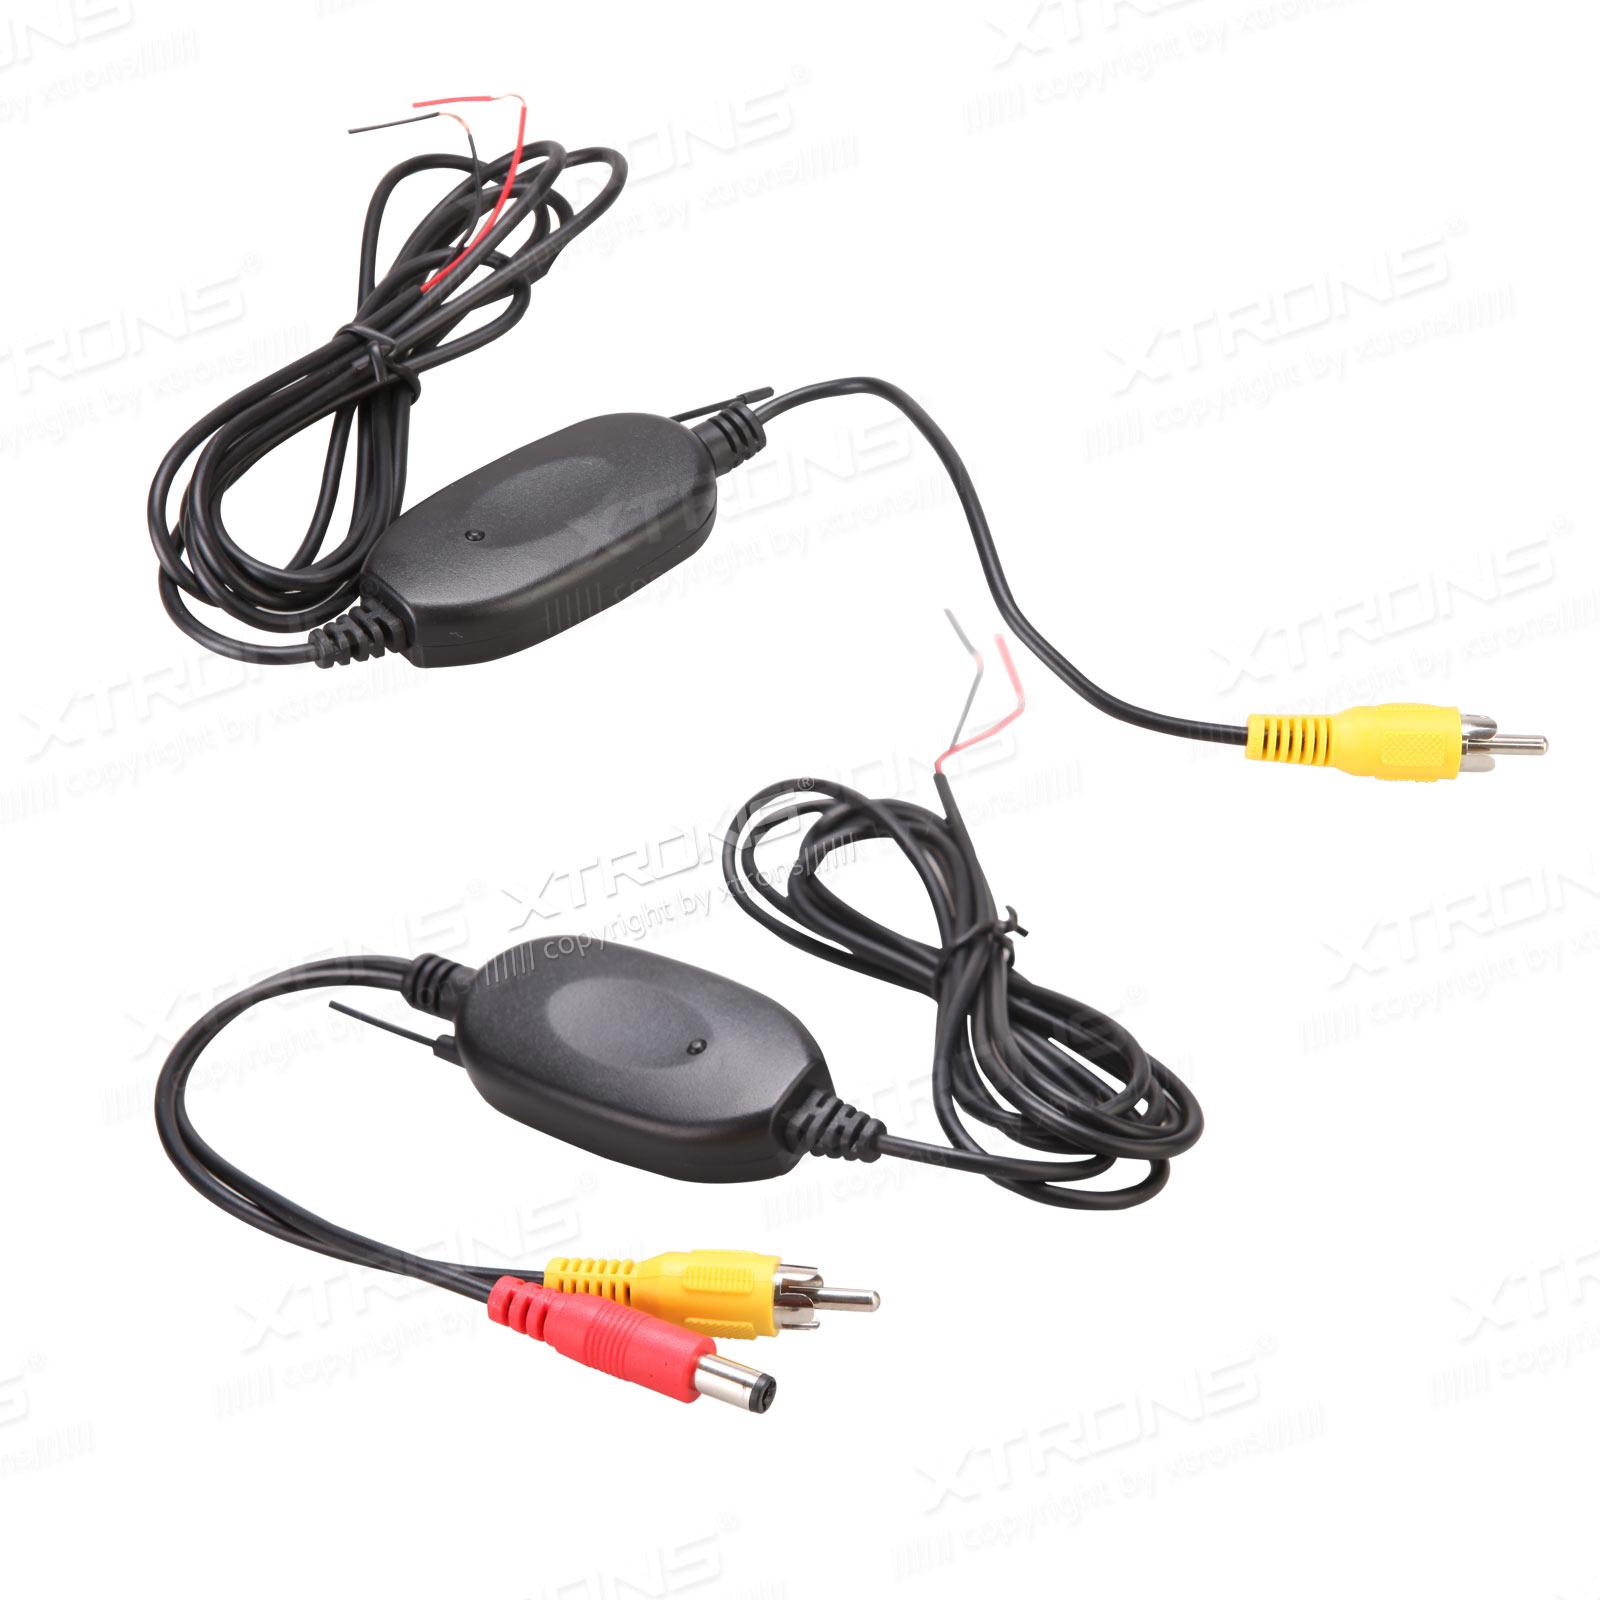 24g Wireless Rca Video Transmitter Receiver For Car Reversing Wiring Plug Cameras Xtrons